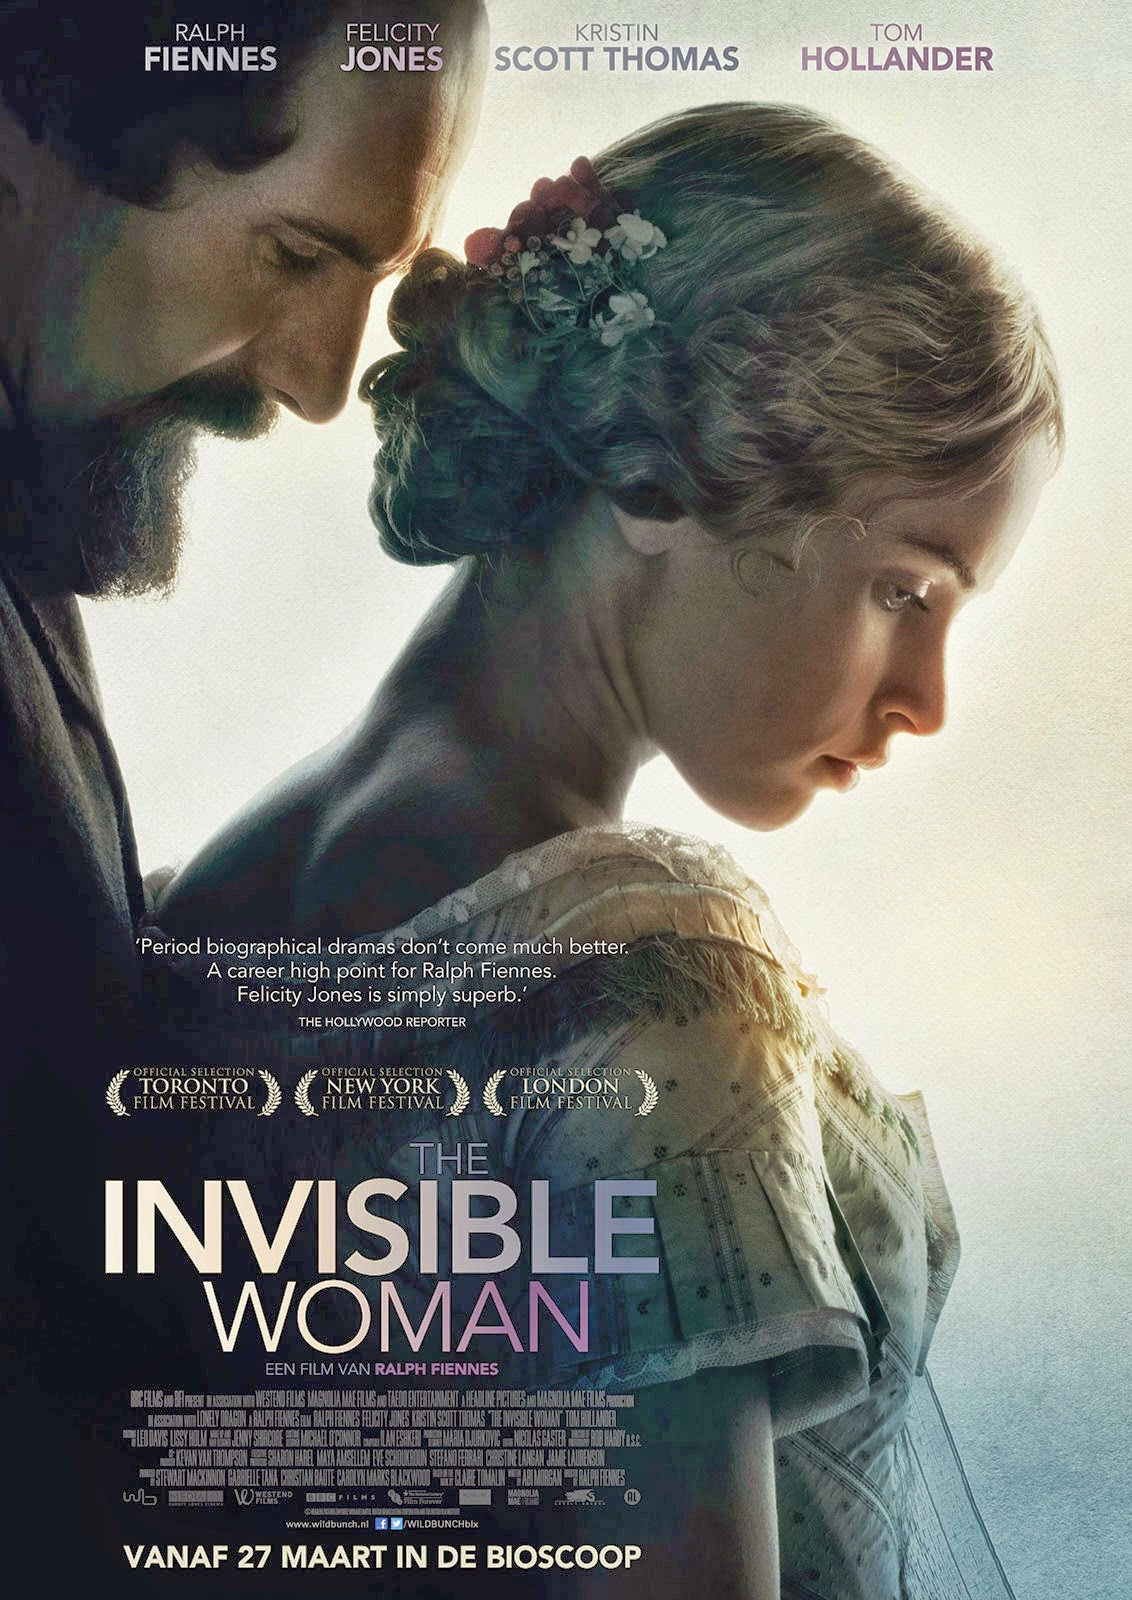 La Mujer Invisible 2013 [DvDRipAudioLatino][Romance]